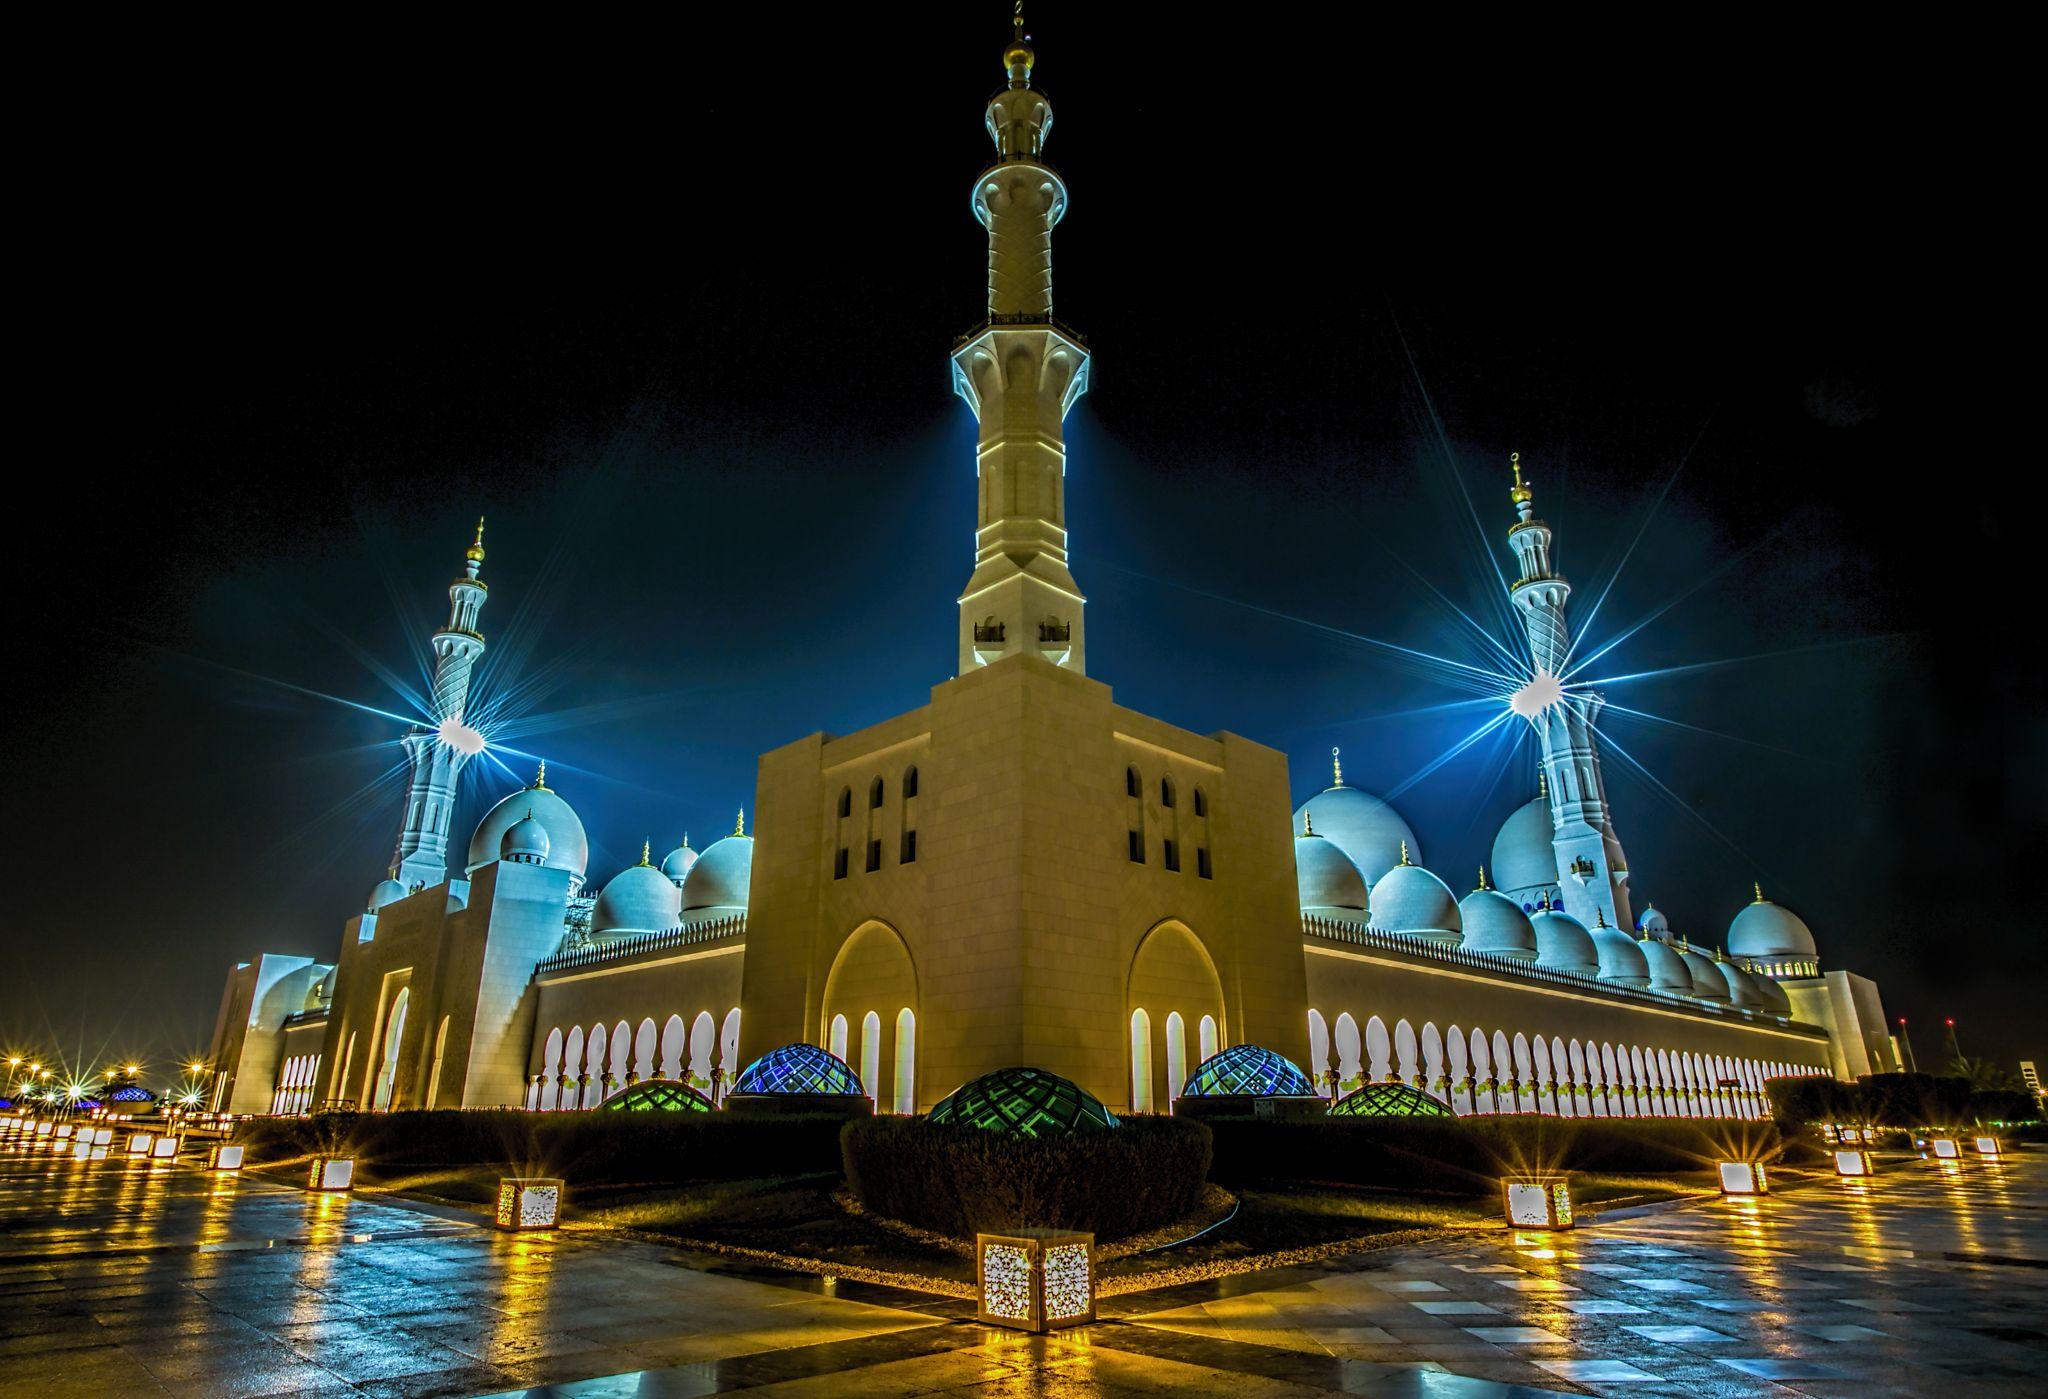 Sheikh Zayed Grand Mosque, Abu Dhabi, UAE, United Arab Emirates